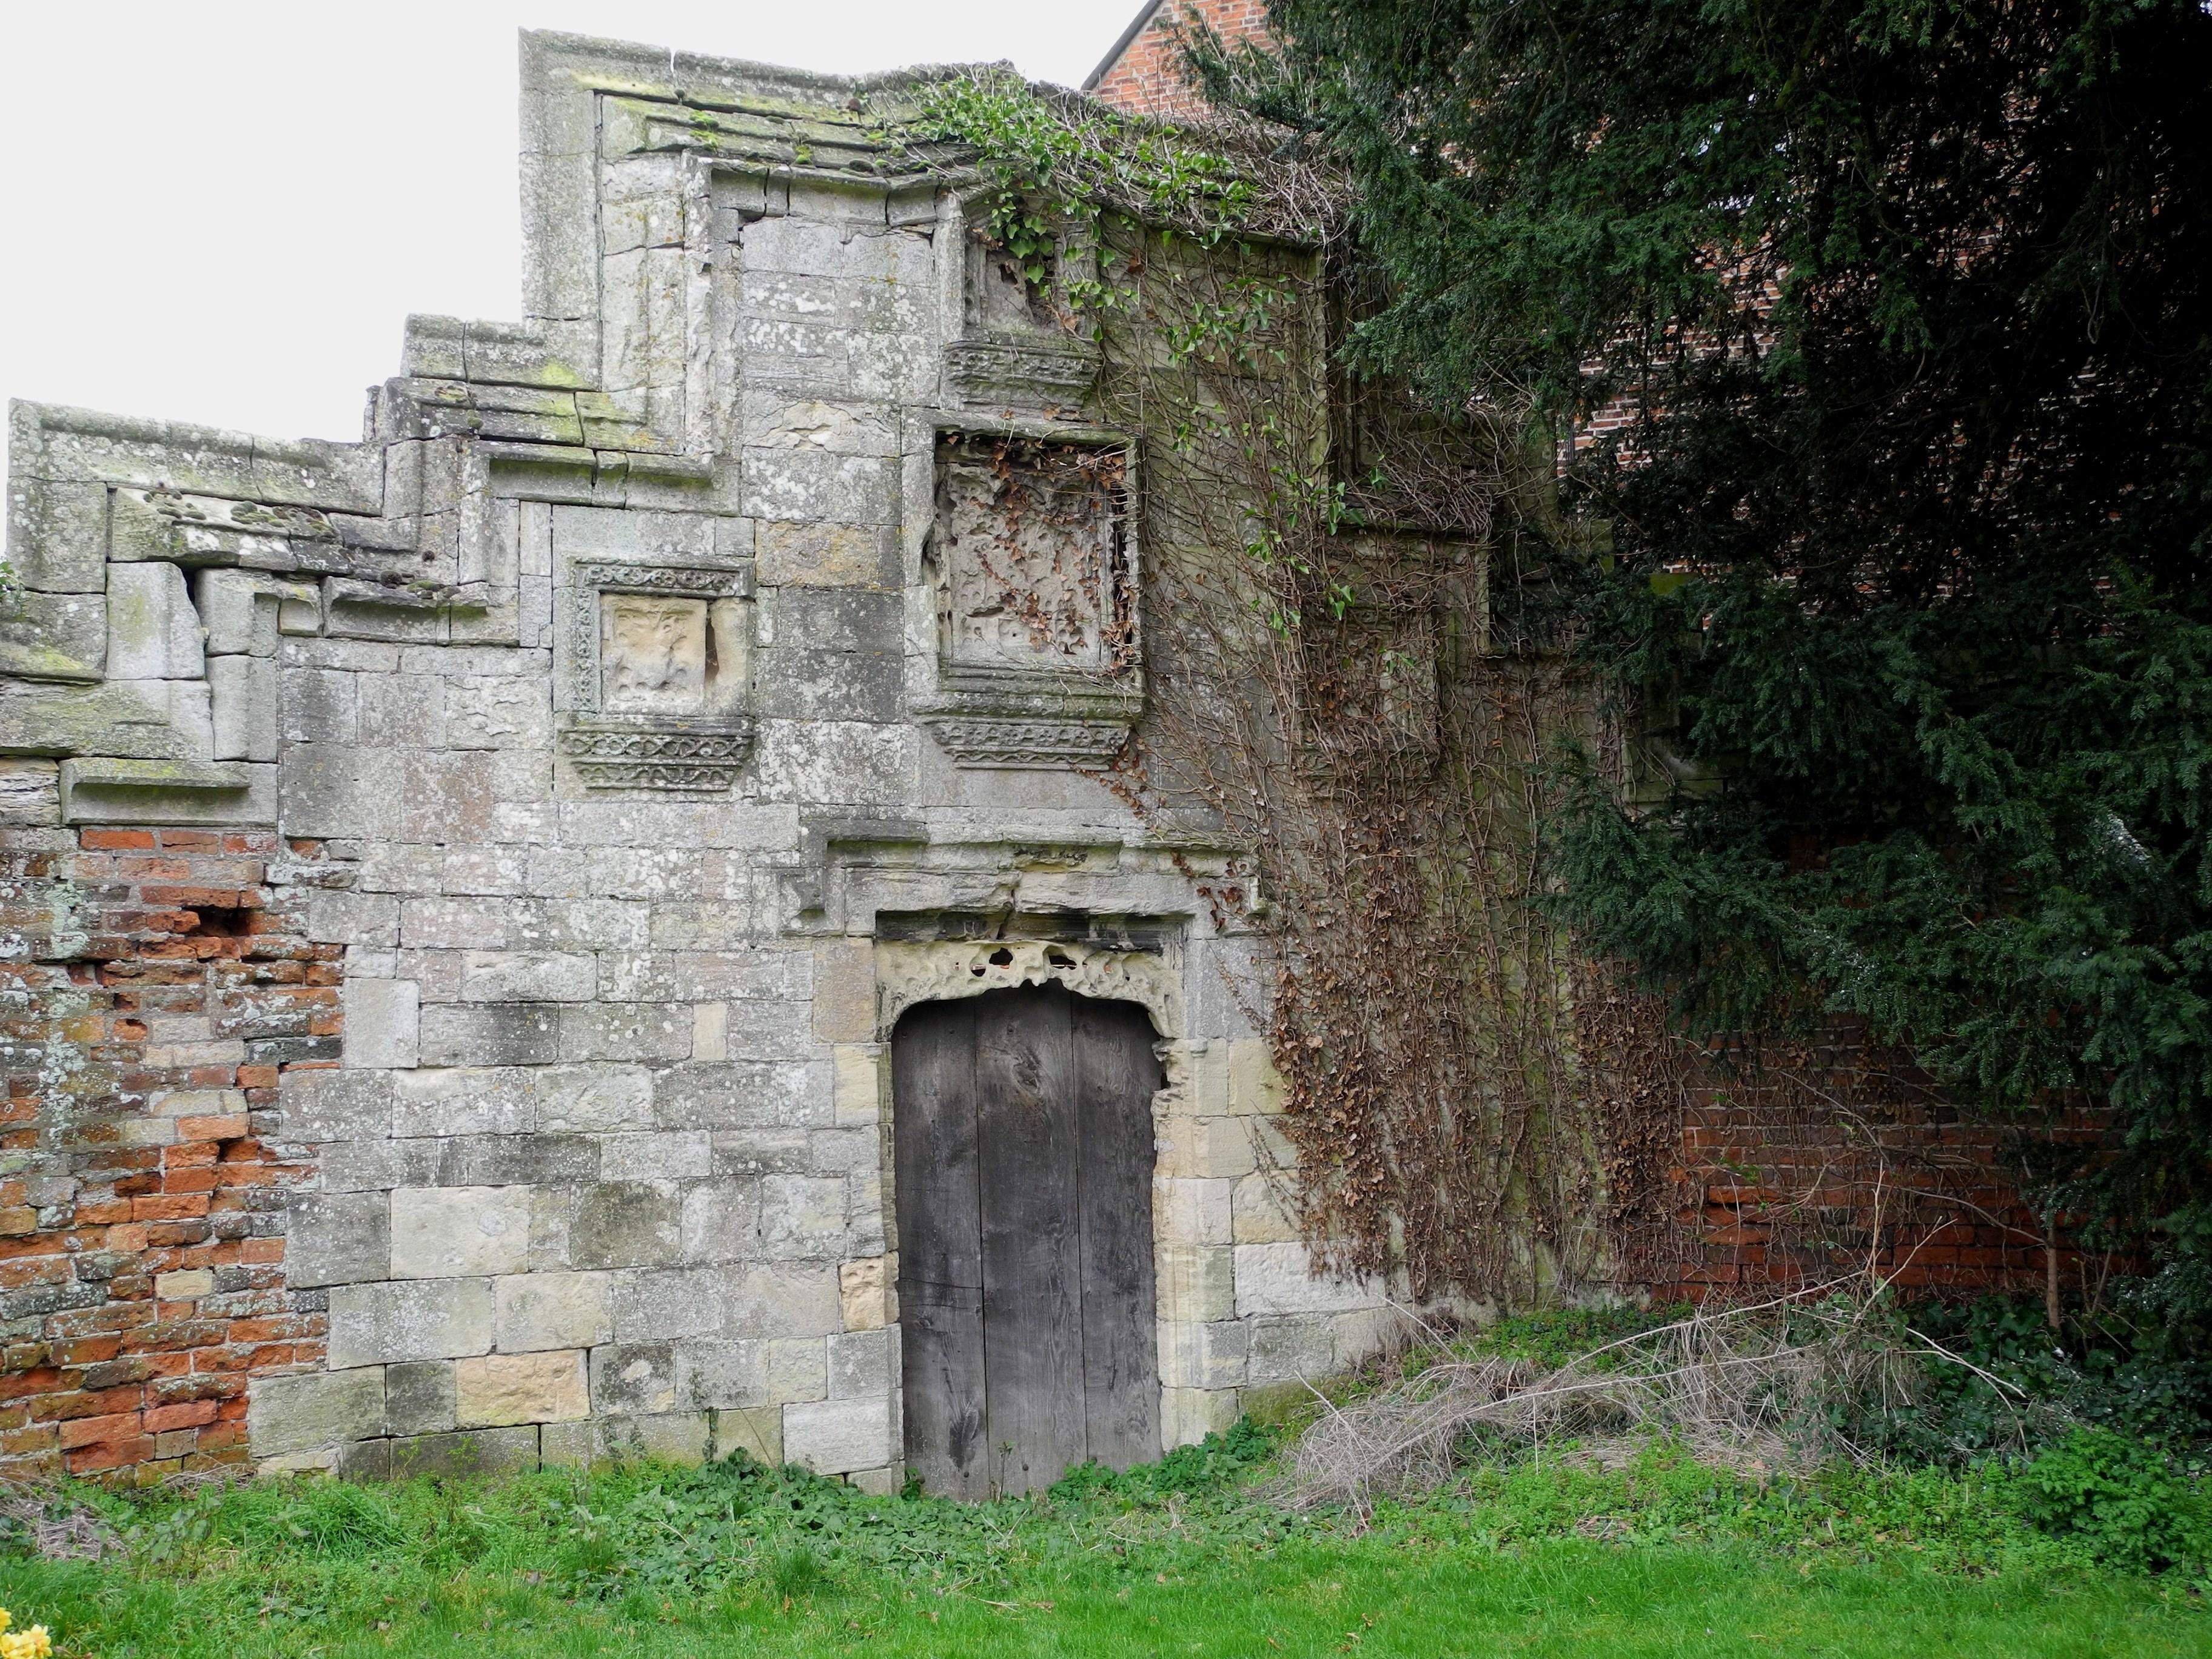 Gateway and walls from Manor Farm to churchyard, Torksey Street, Rampton